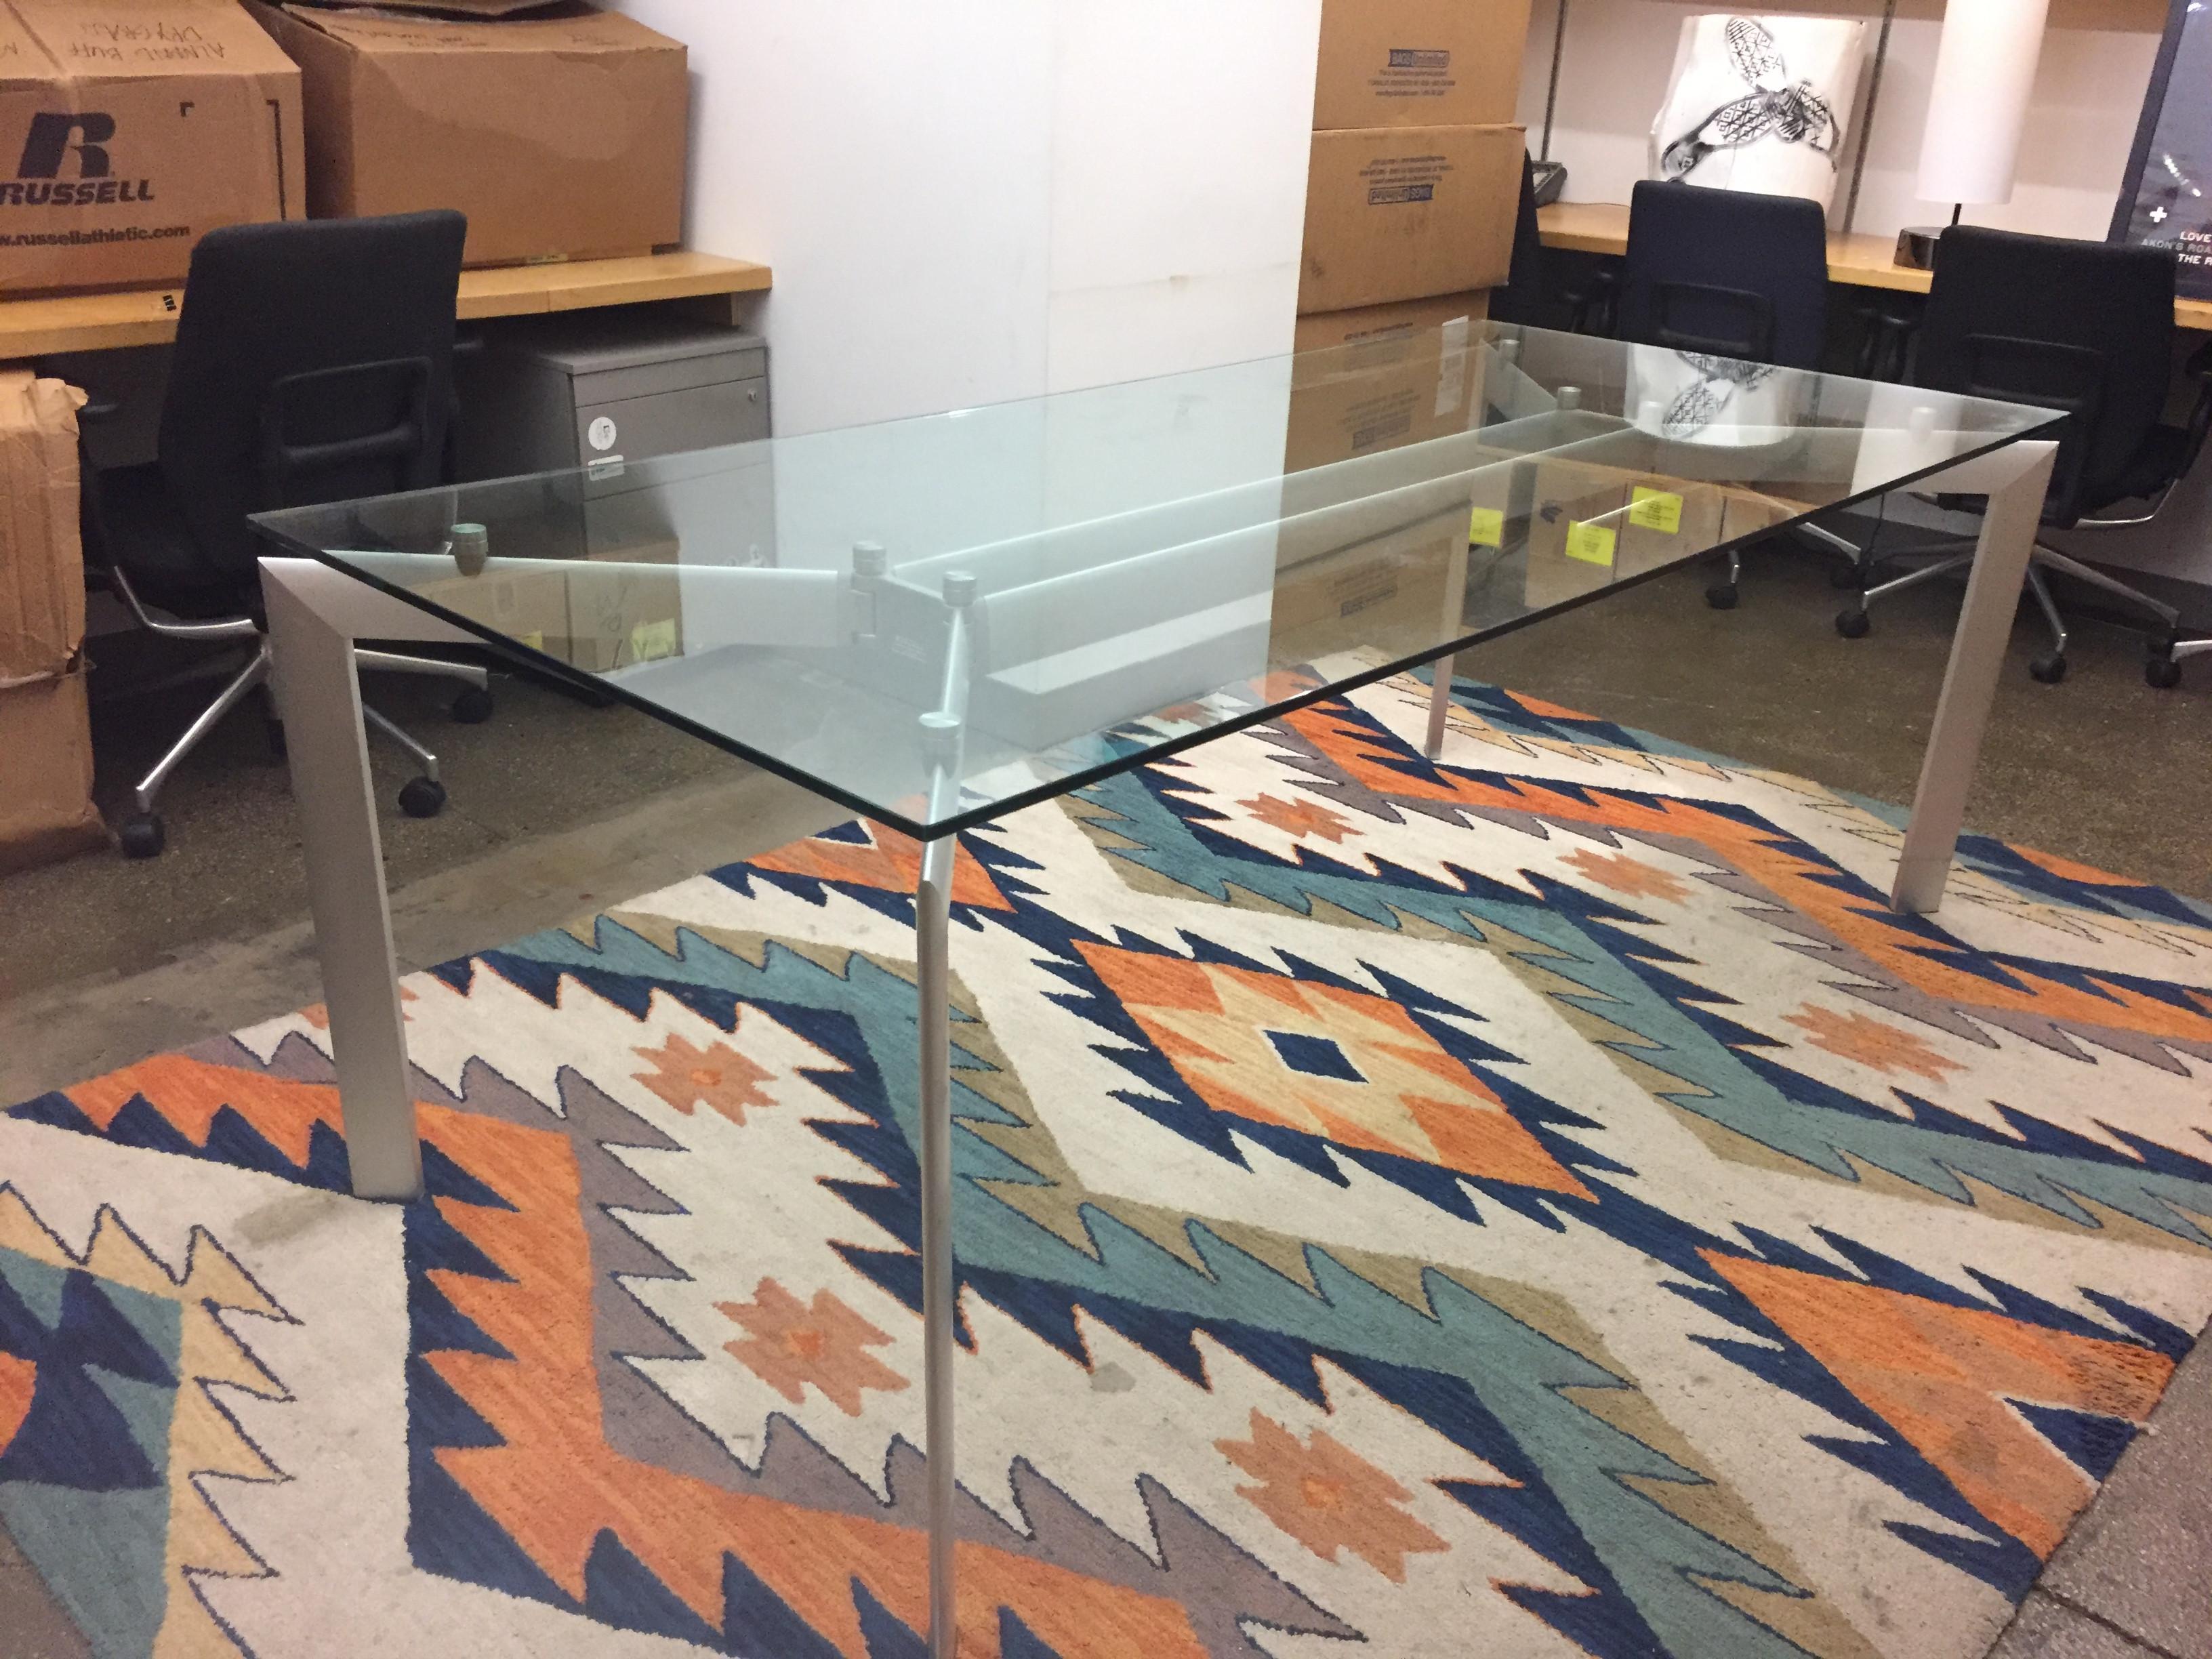 Glass Top Table w/ Metal Legs